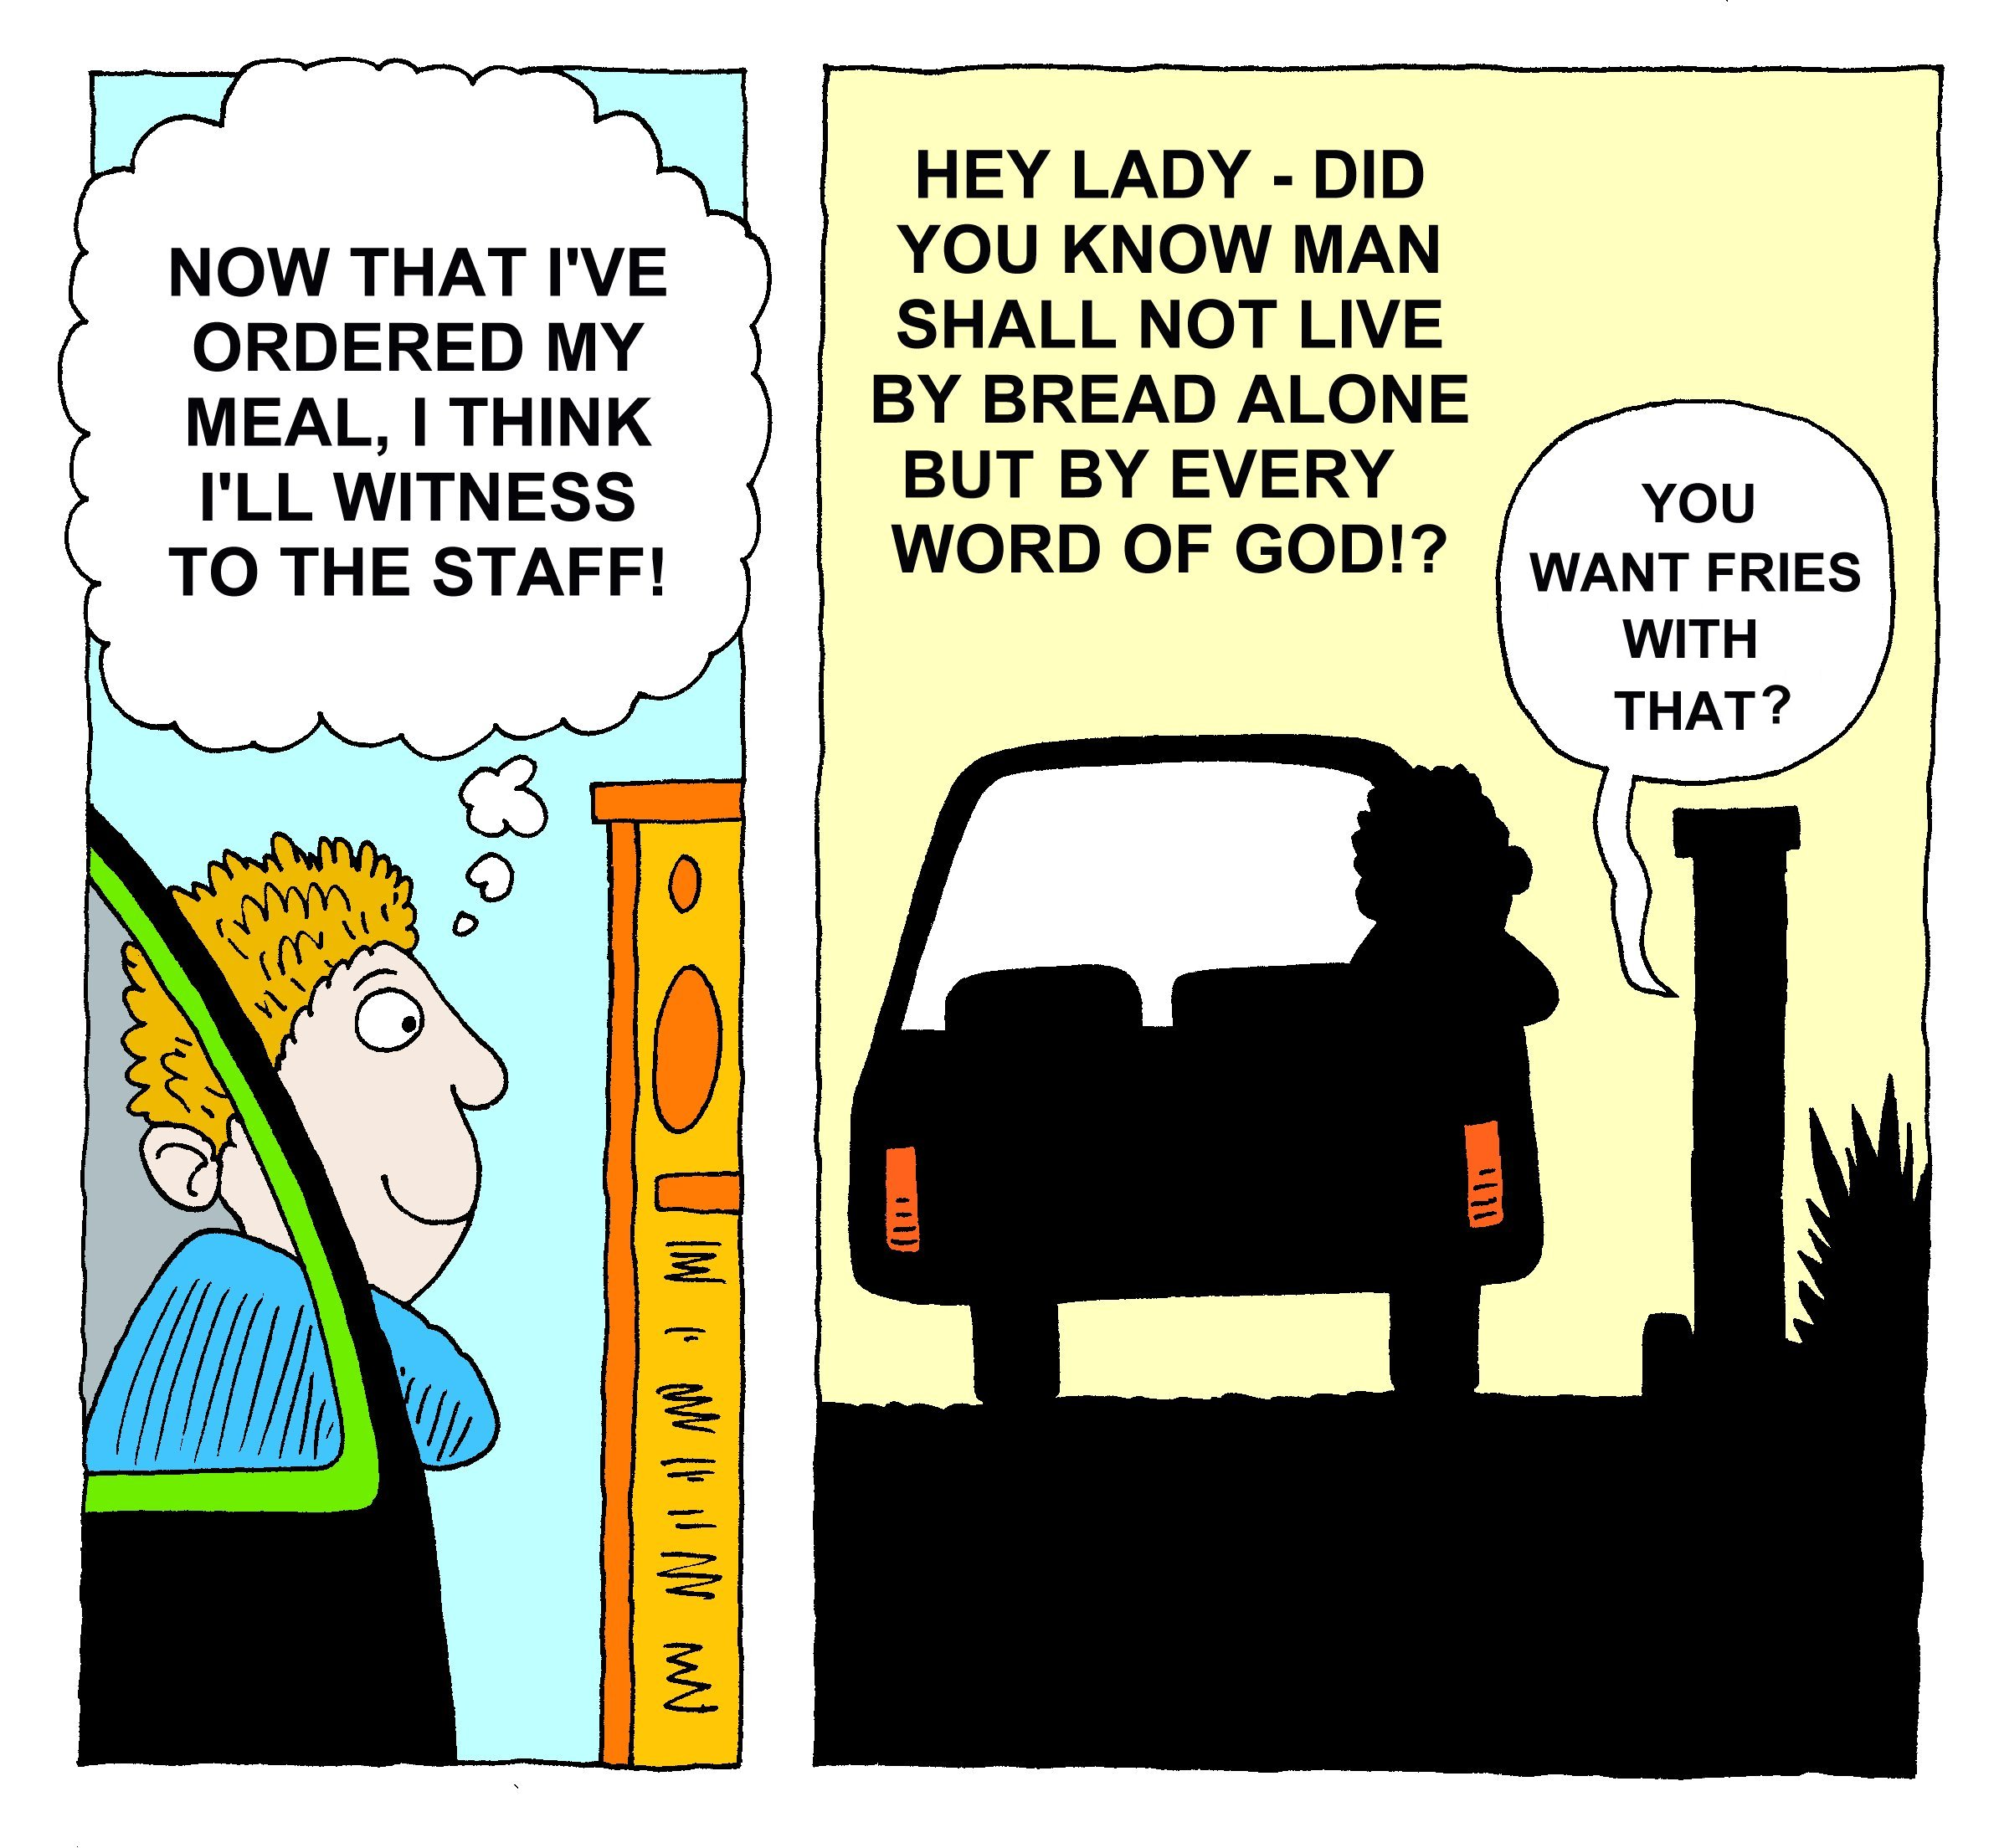 Irregular verbs exercises the princess and pea / past king david.